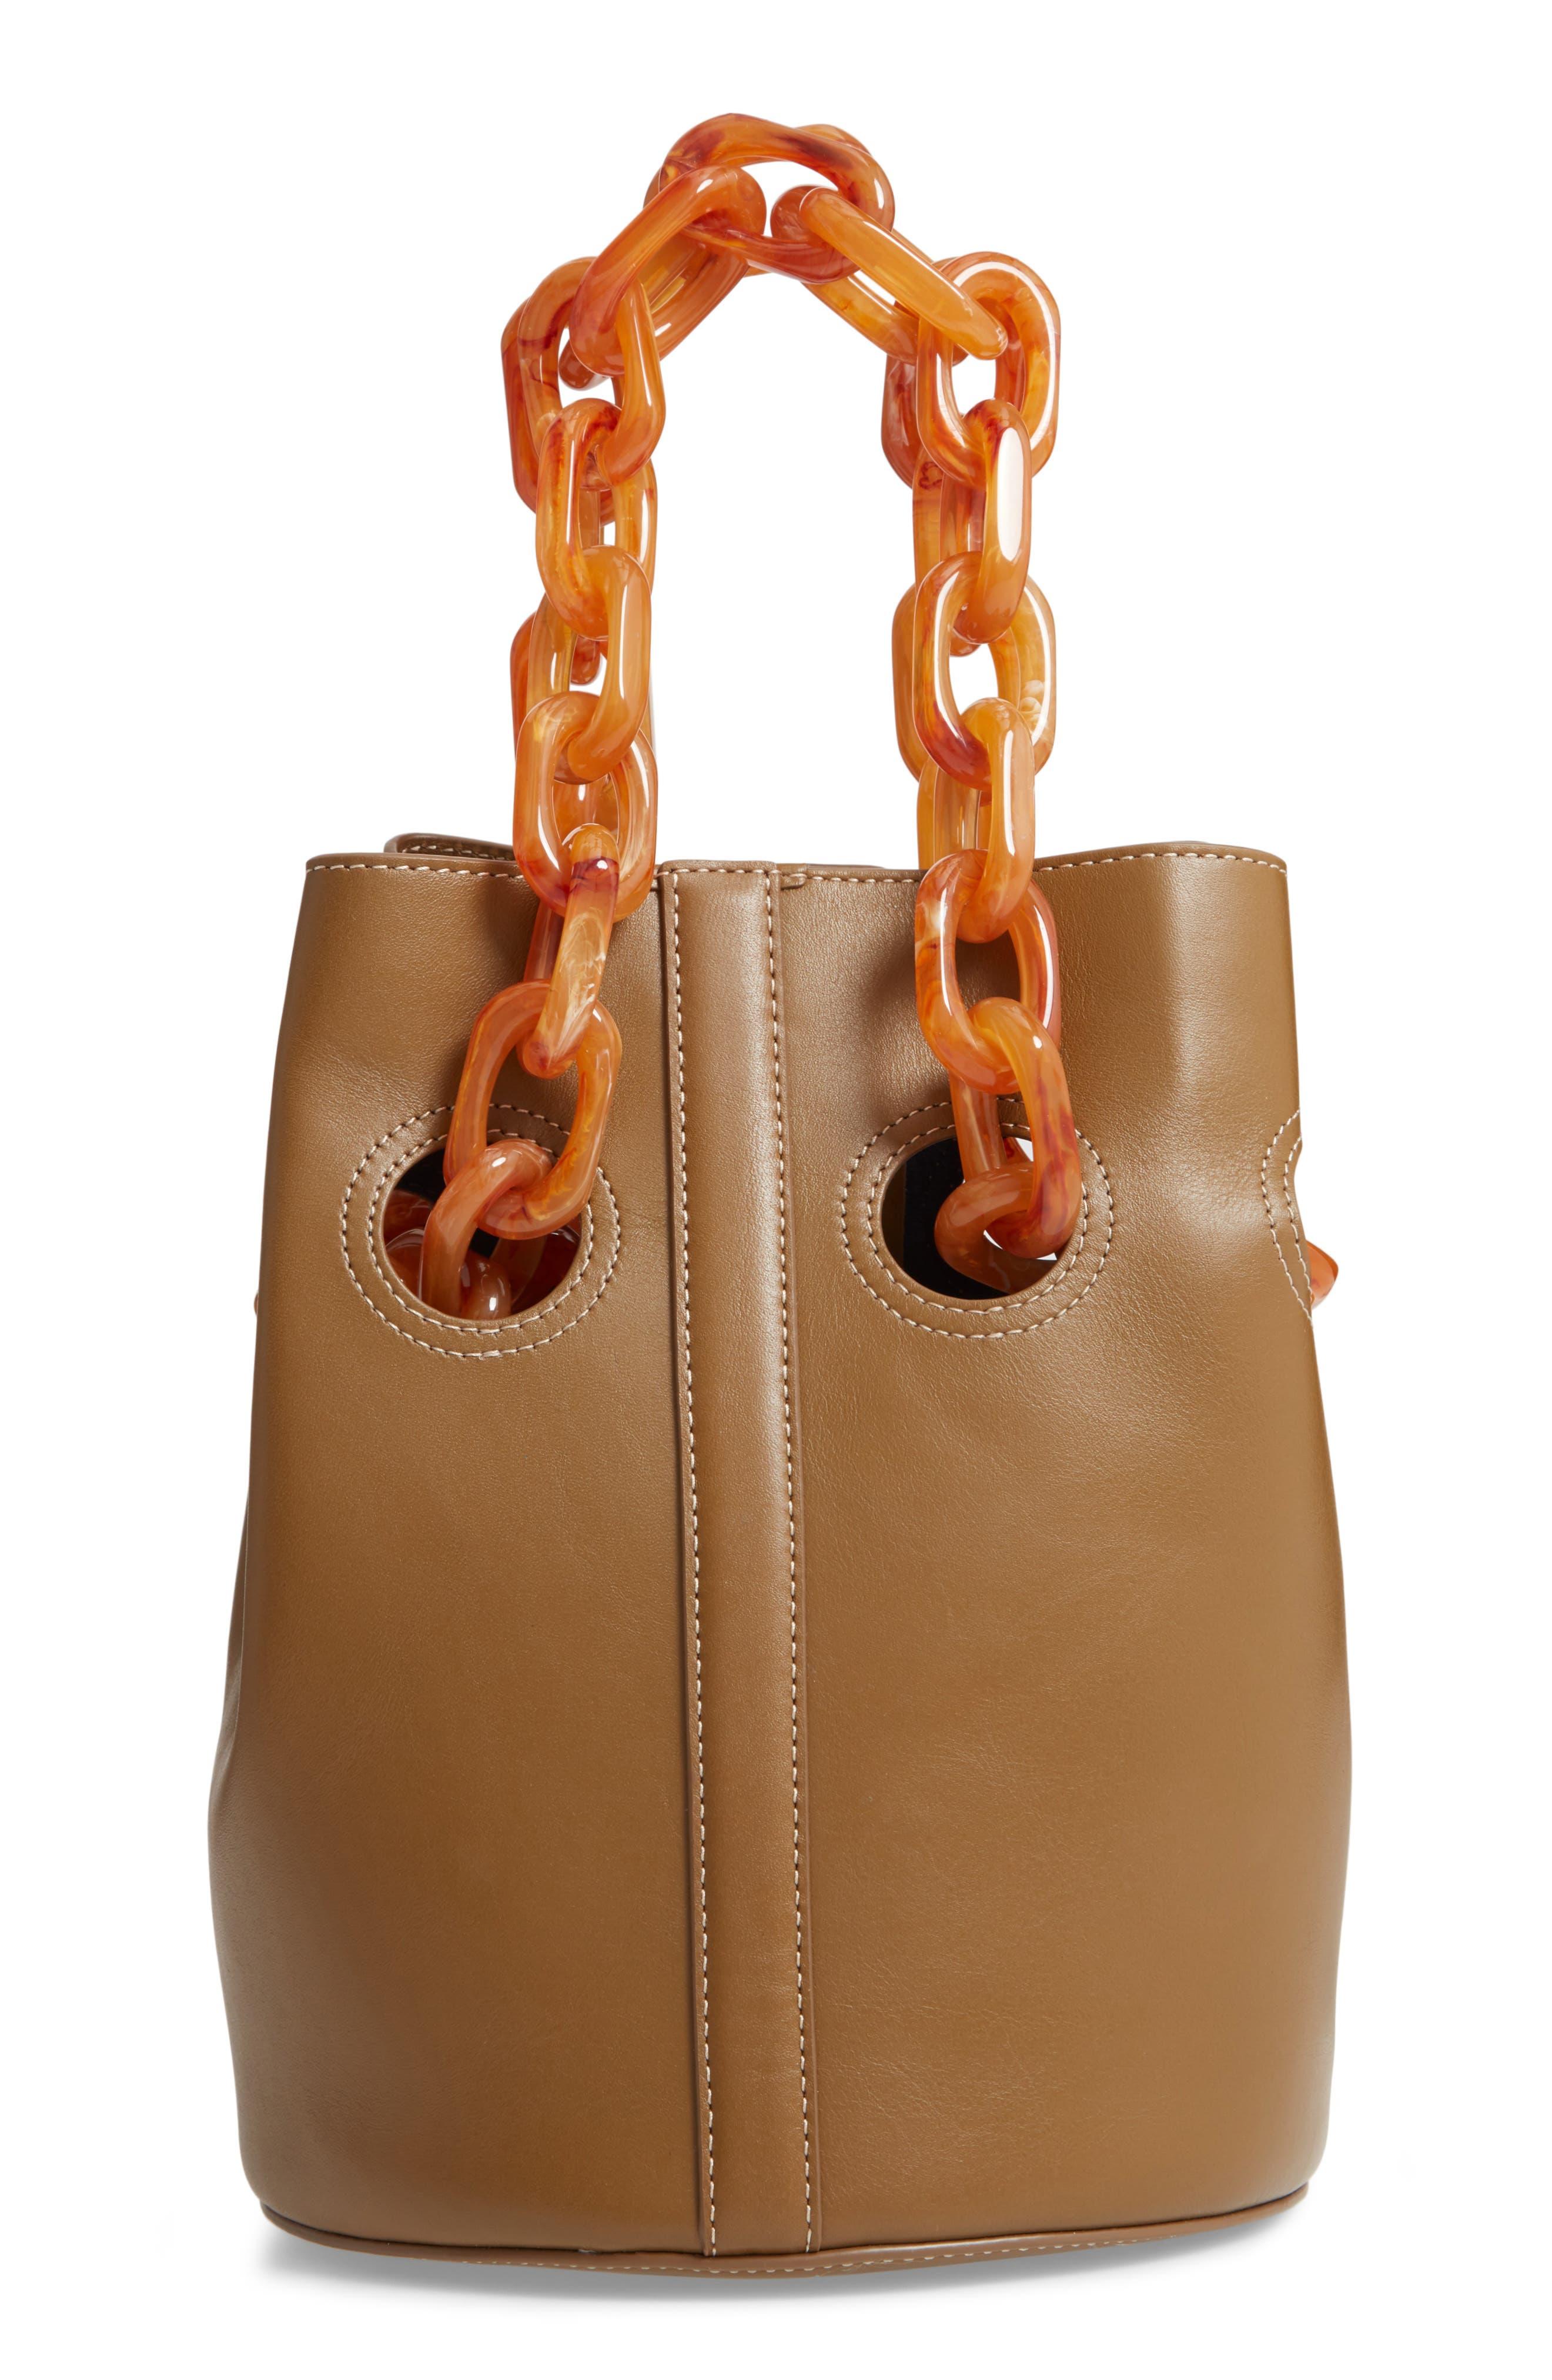 Goodall Leather Bucket Bag,                             Main thumbnail 1, color,                             200